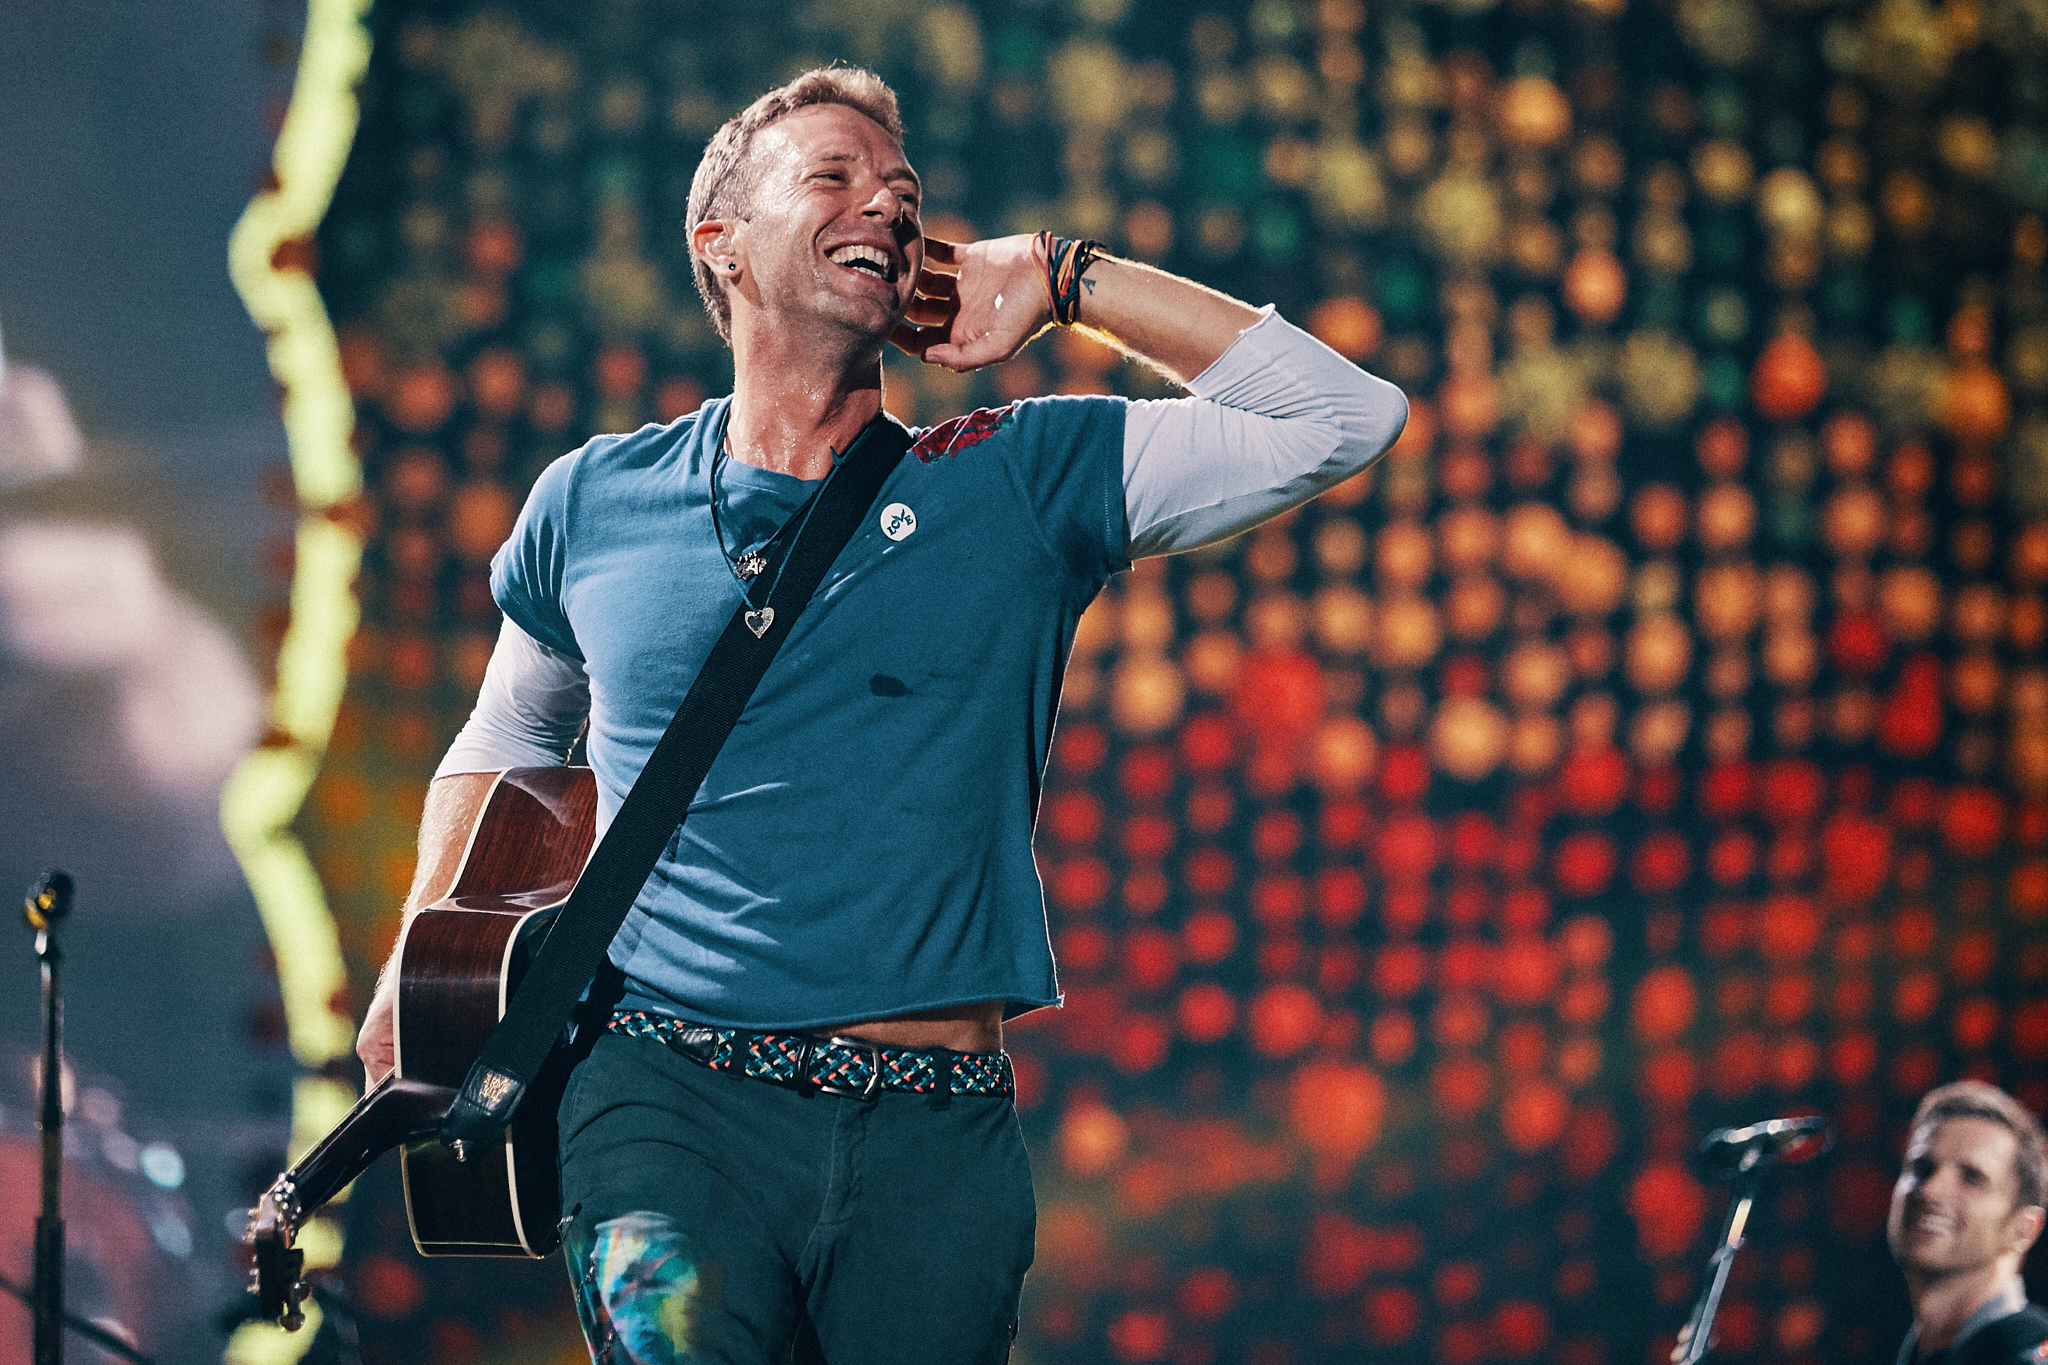 Coldplay_US_Bank_Stadium_Minneapolis_Minnesota_Photography_By_Joe_Lemke_039.JPG